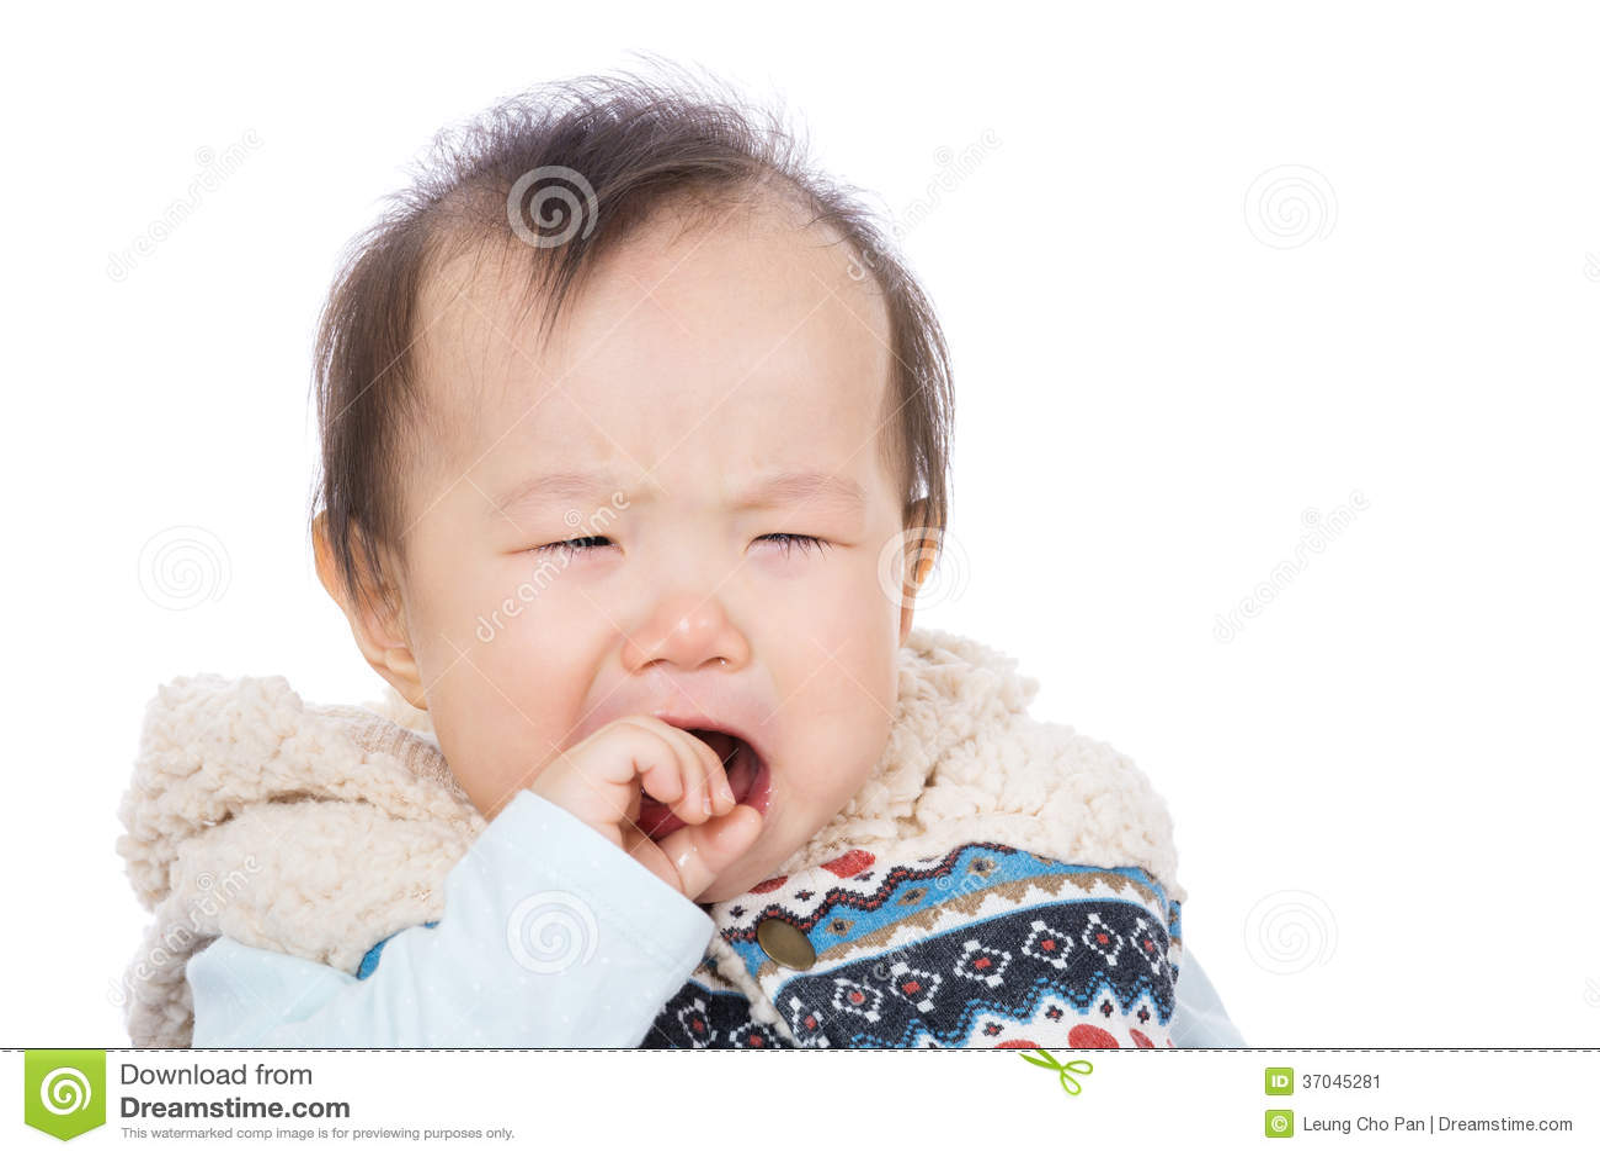 Asian baby girl crying